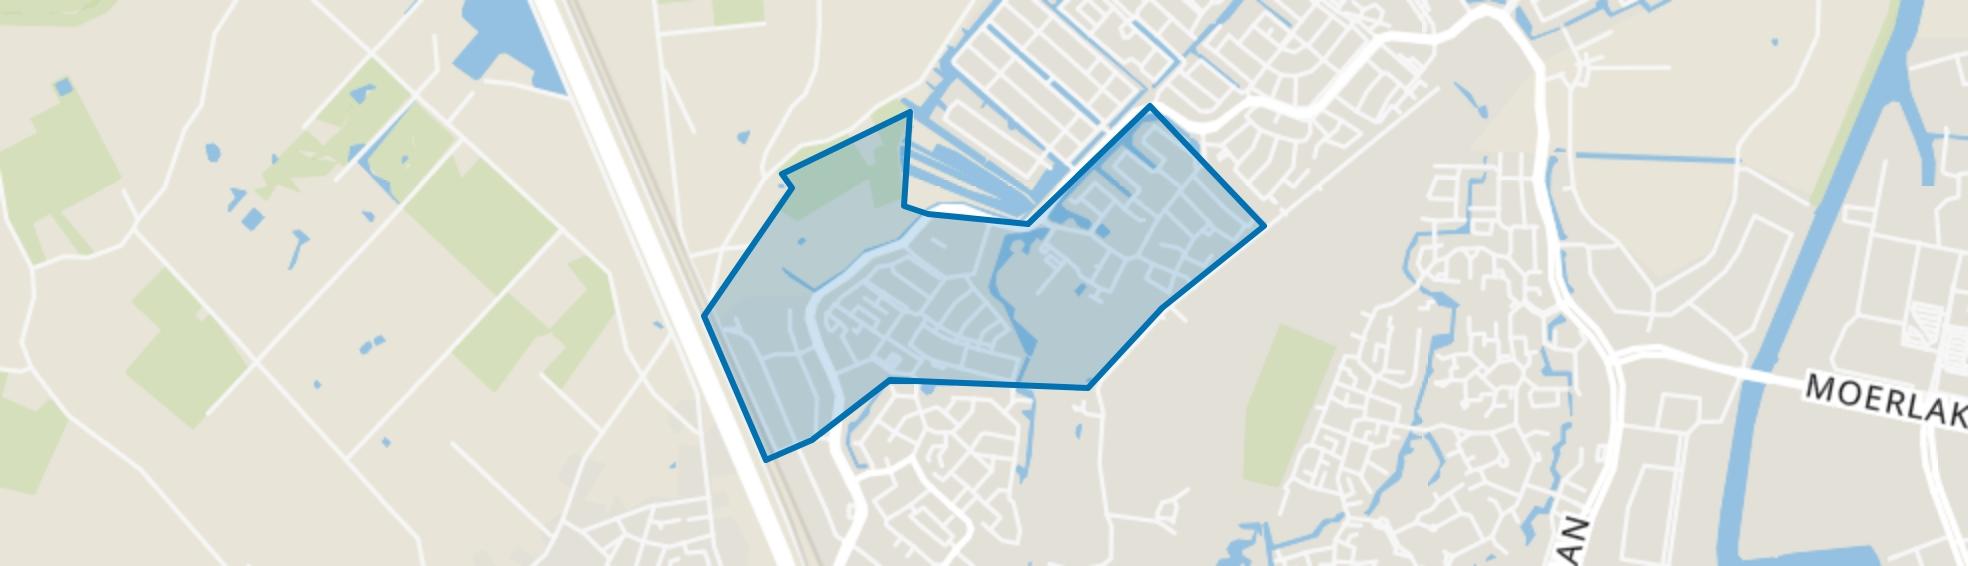 Muizenberg, Breda map